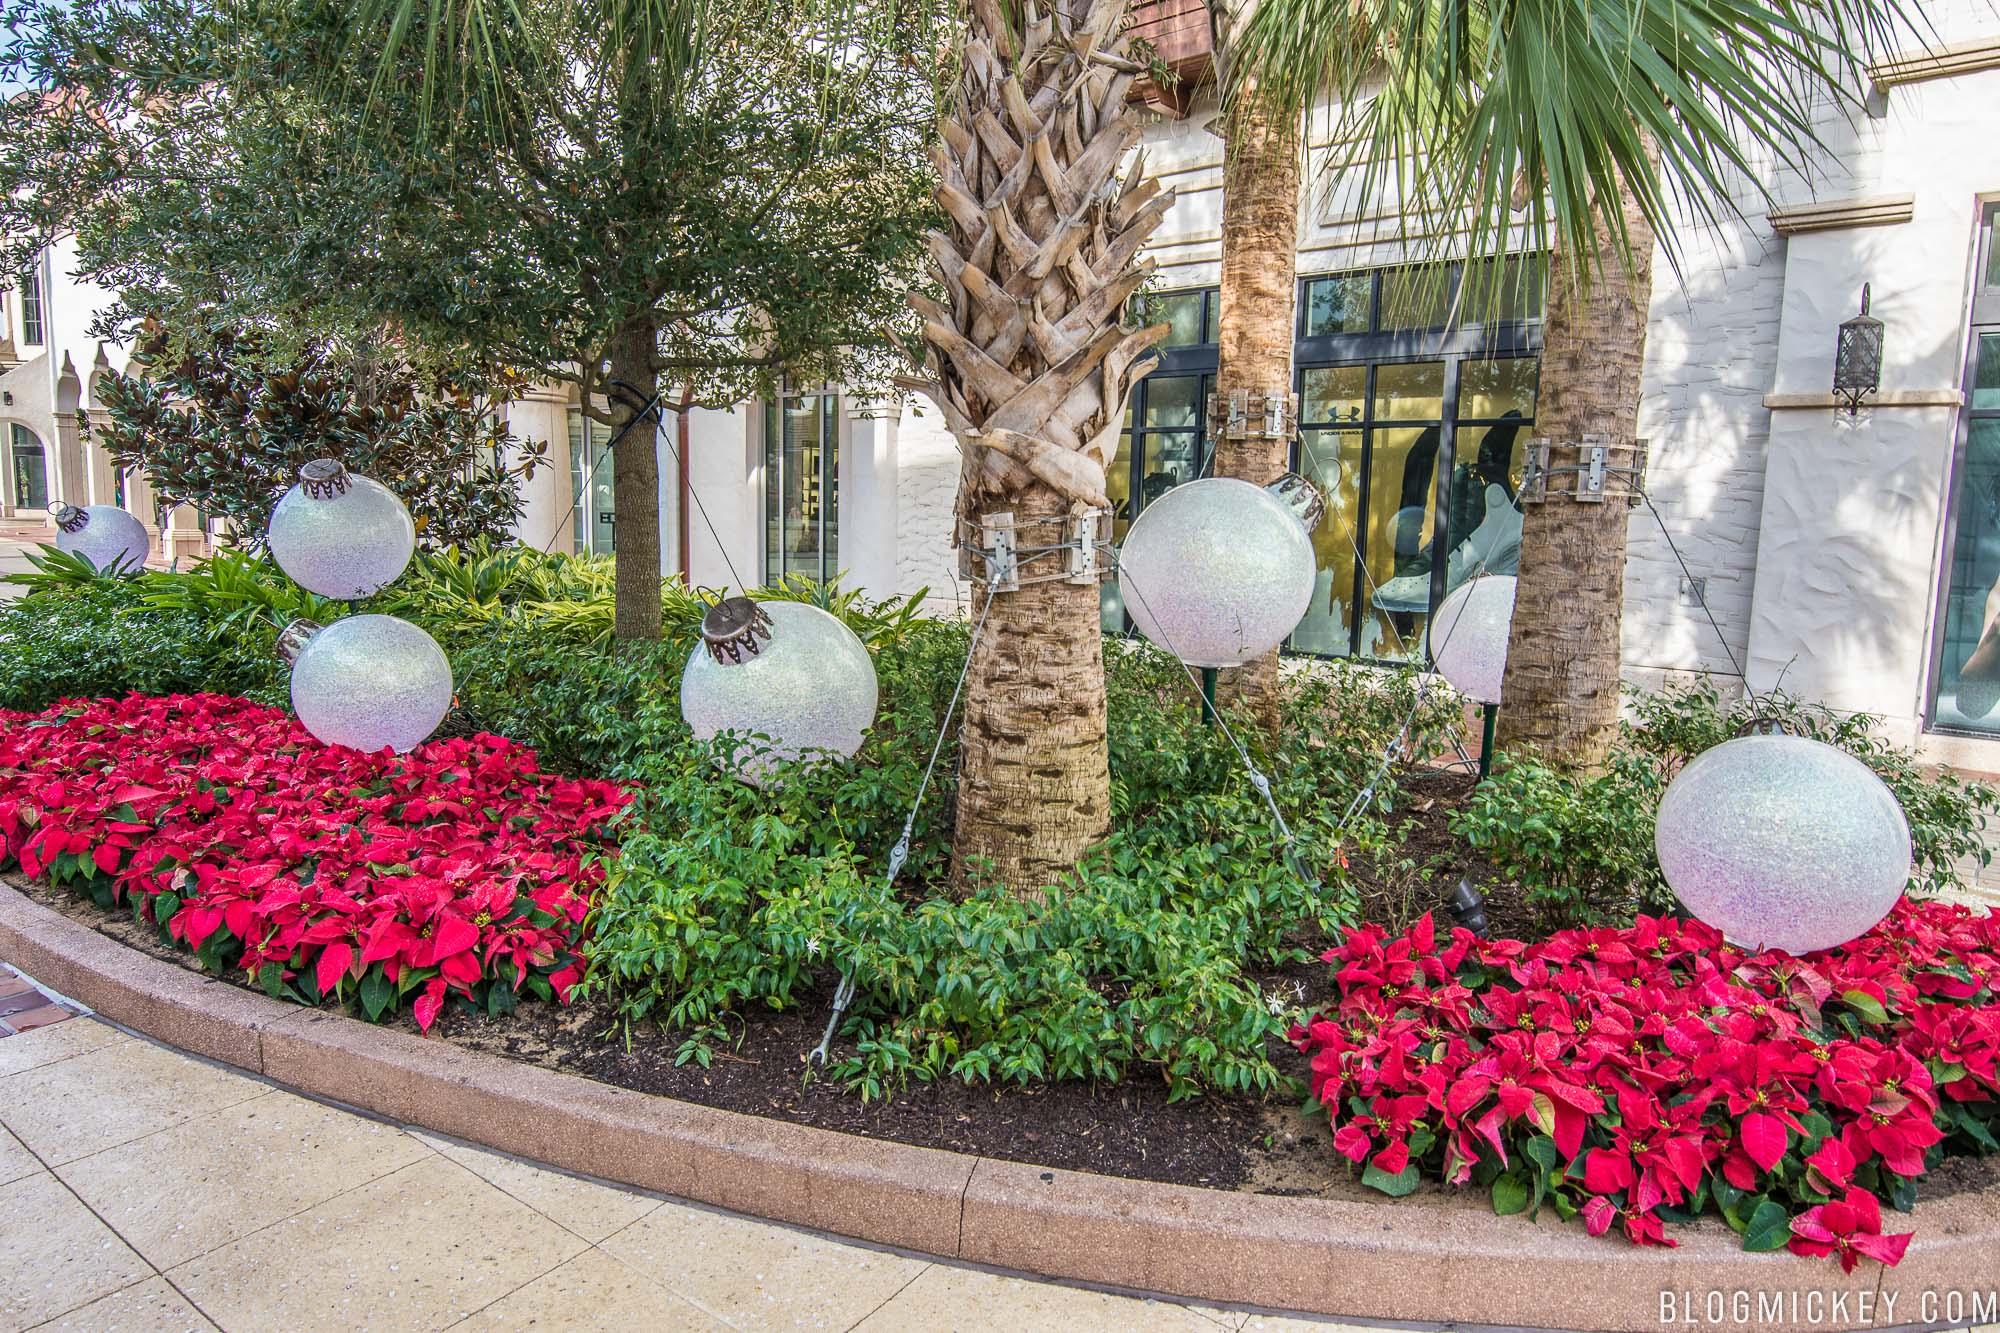 PHOTOS: 2017 Christmas Decorations at Disney Springs - Blog Mickey